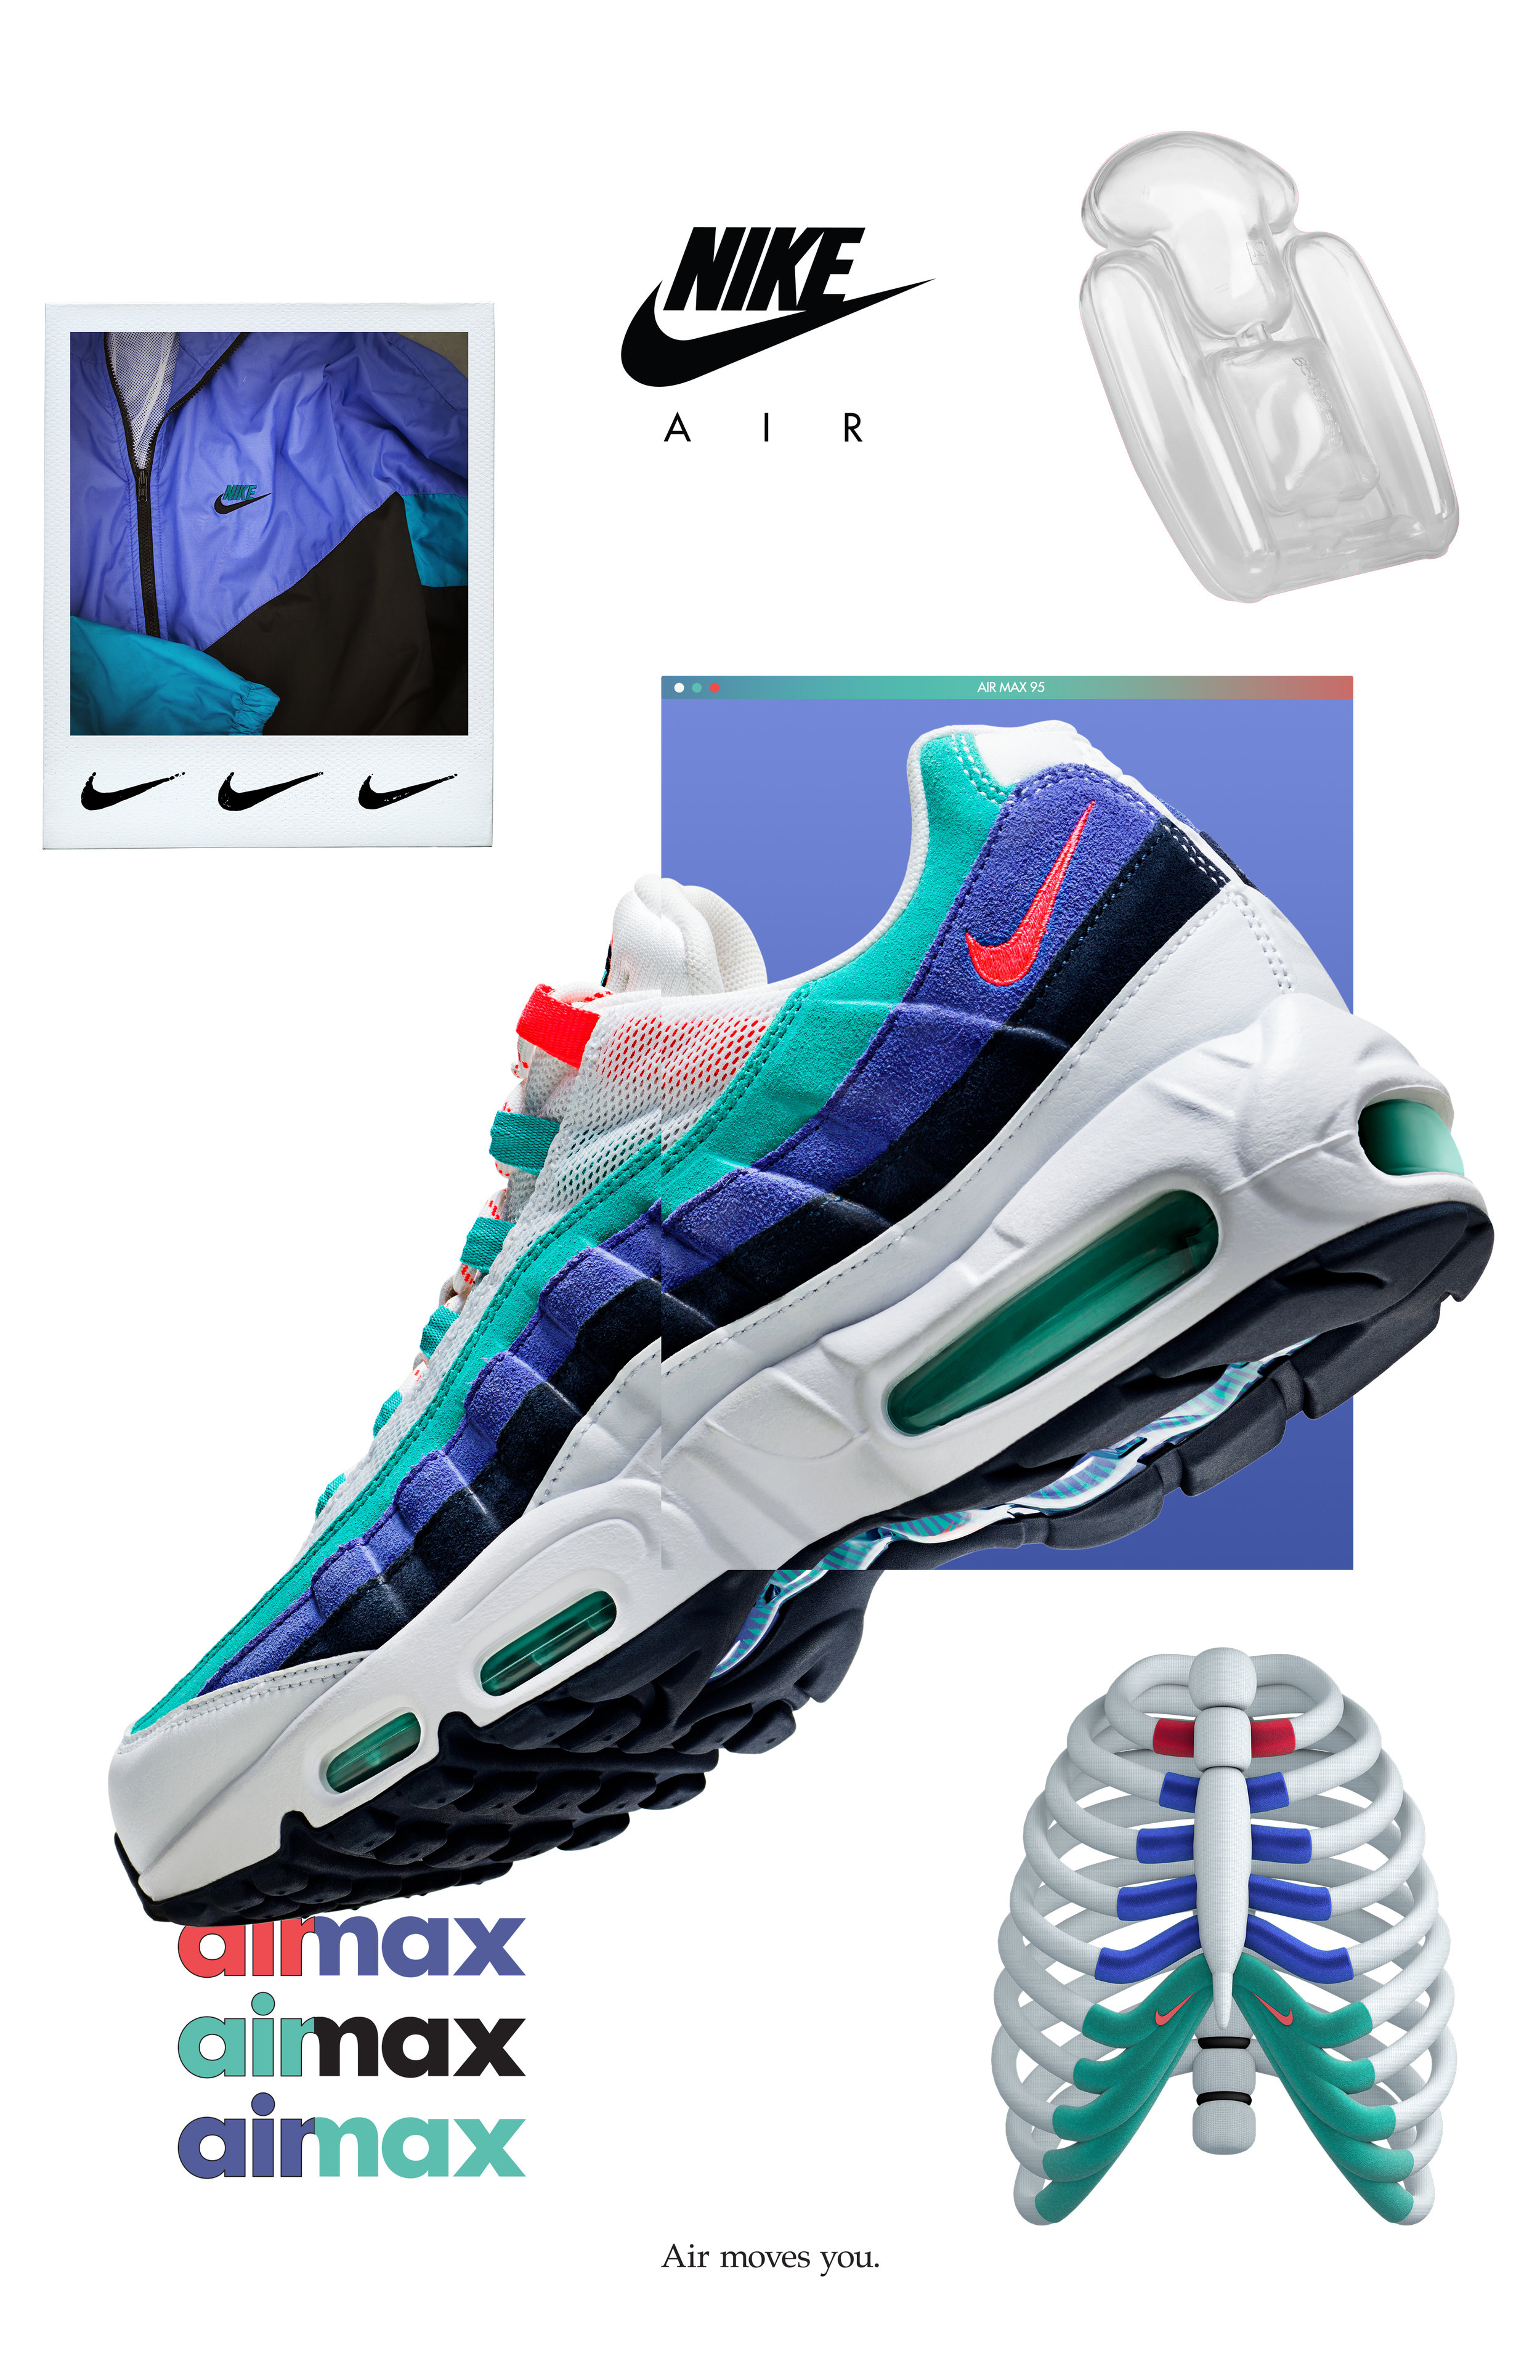 Nike X Footlocker Air Max Origins Jake Tieman